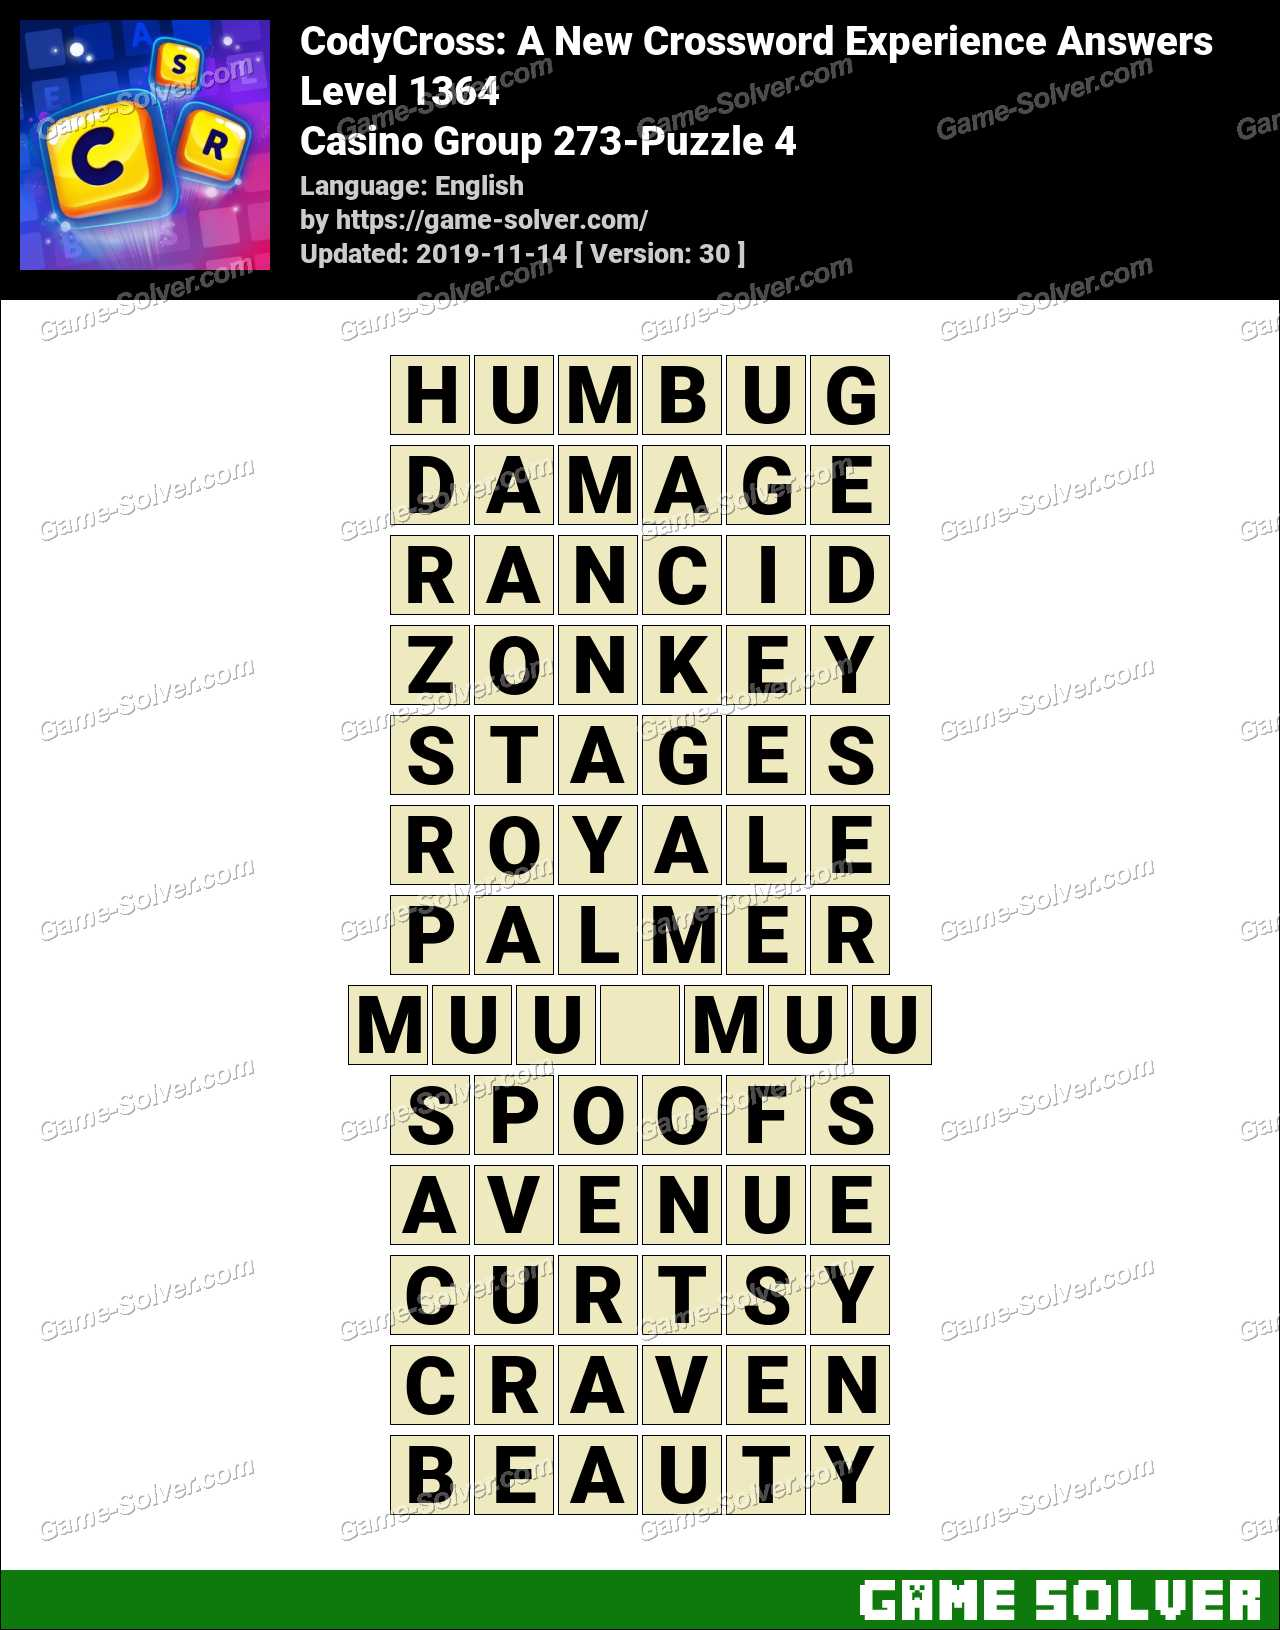 CodyCross Casino Group 273-Puzzle 4 Answers